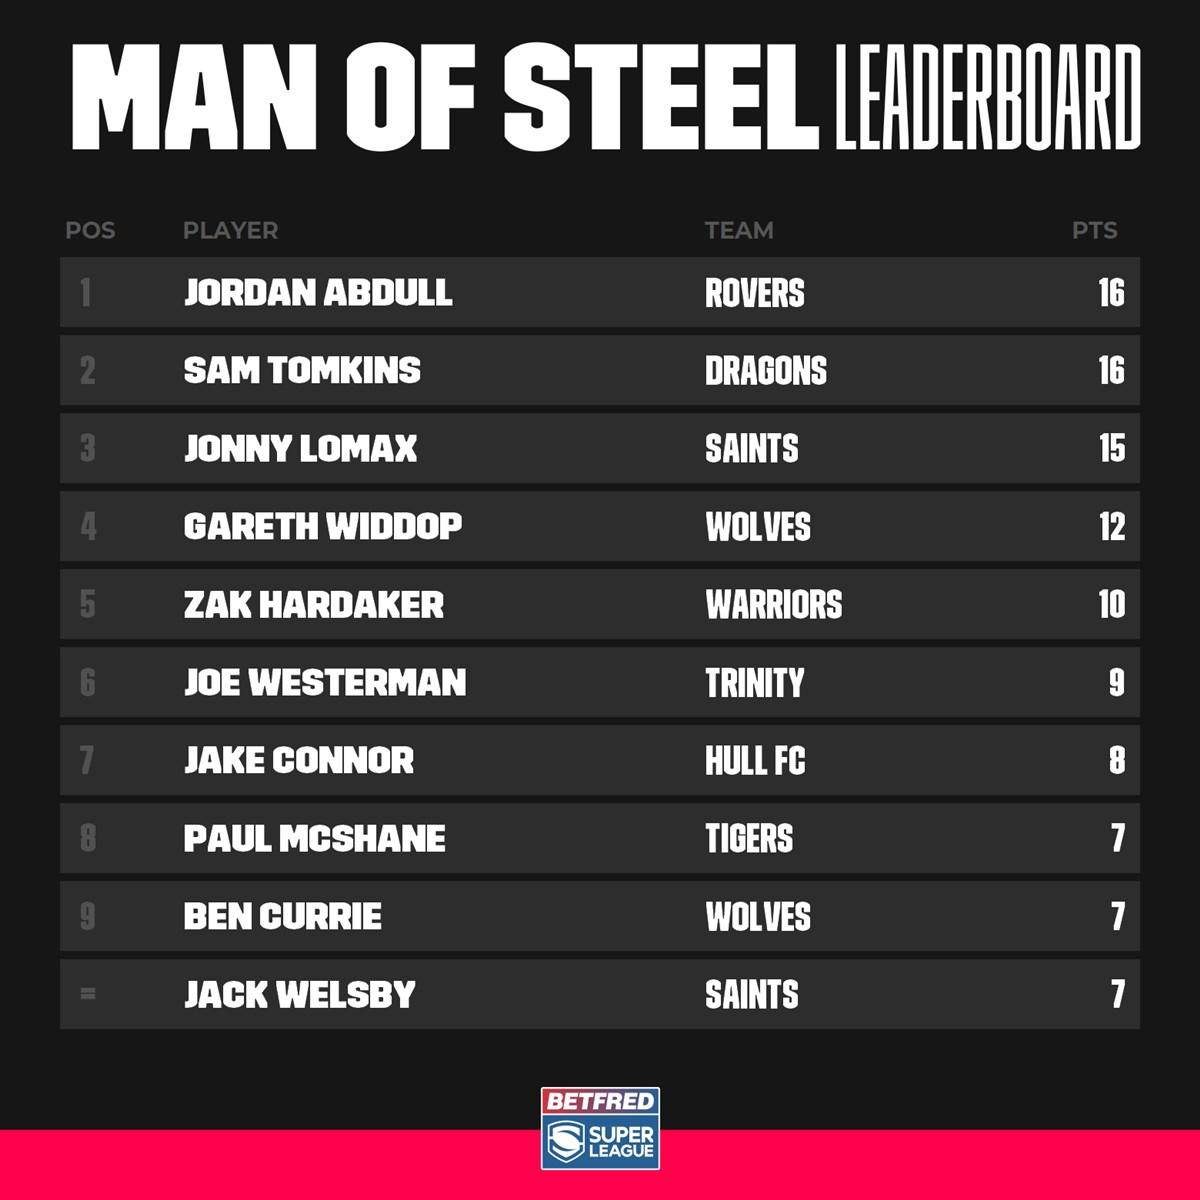 Abdull leading MOS voting. Ryan Hall leading SL try scorer. Little old @hullkrofficial ruffling a few feathers it seems. Great stuff 😎